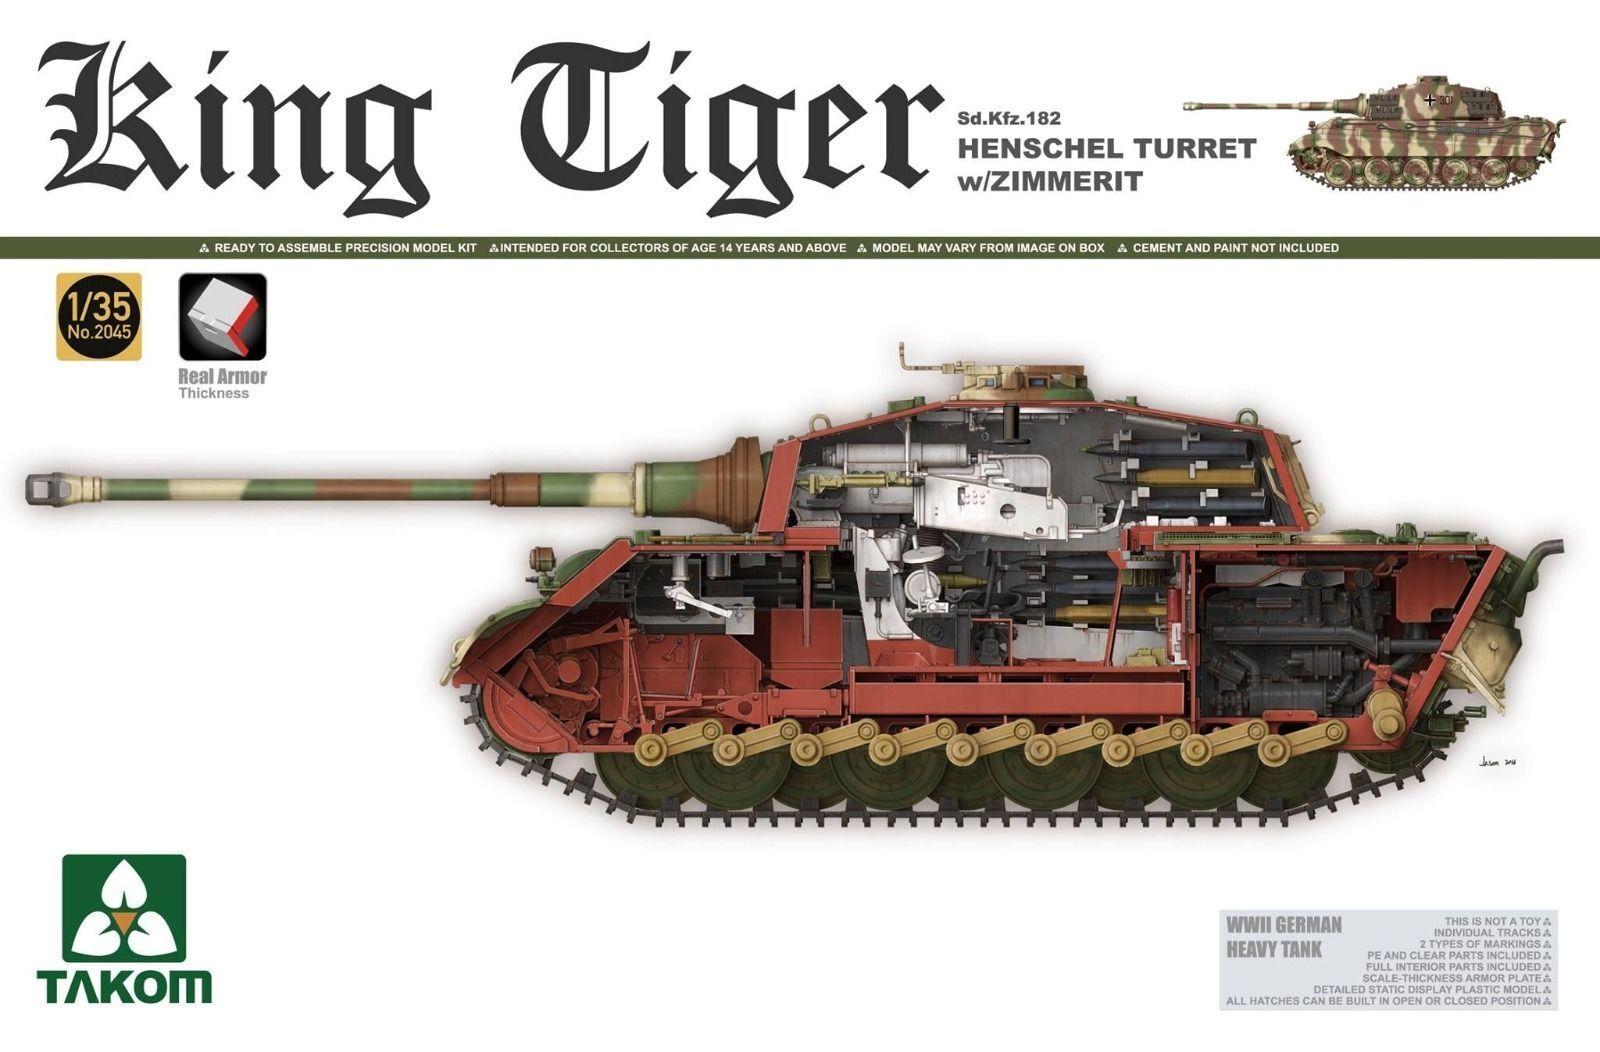 Takom 2045 1 35 Sd.Kfz.182 King Tiger Henschel Turret w Zimmerit